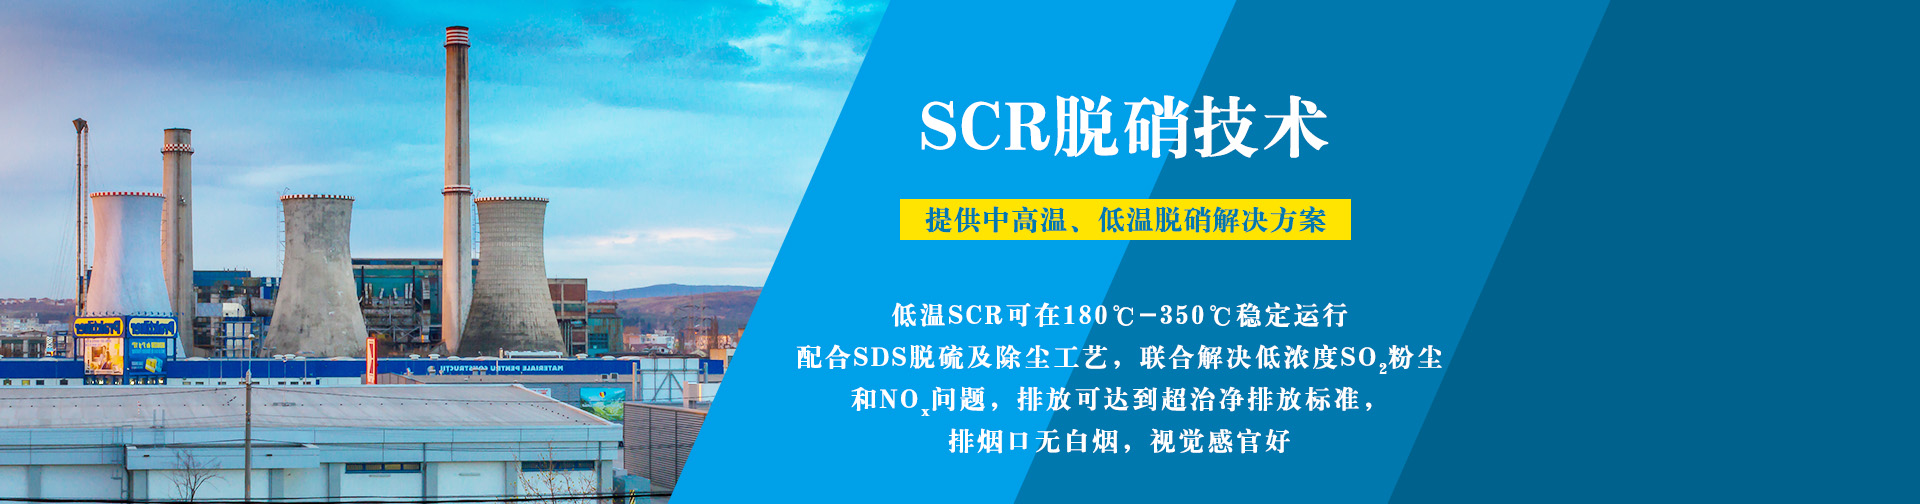 SCR脱硝技术